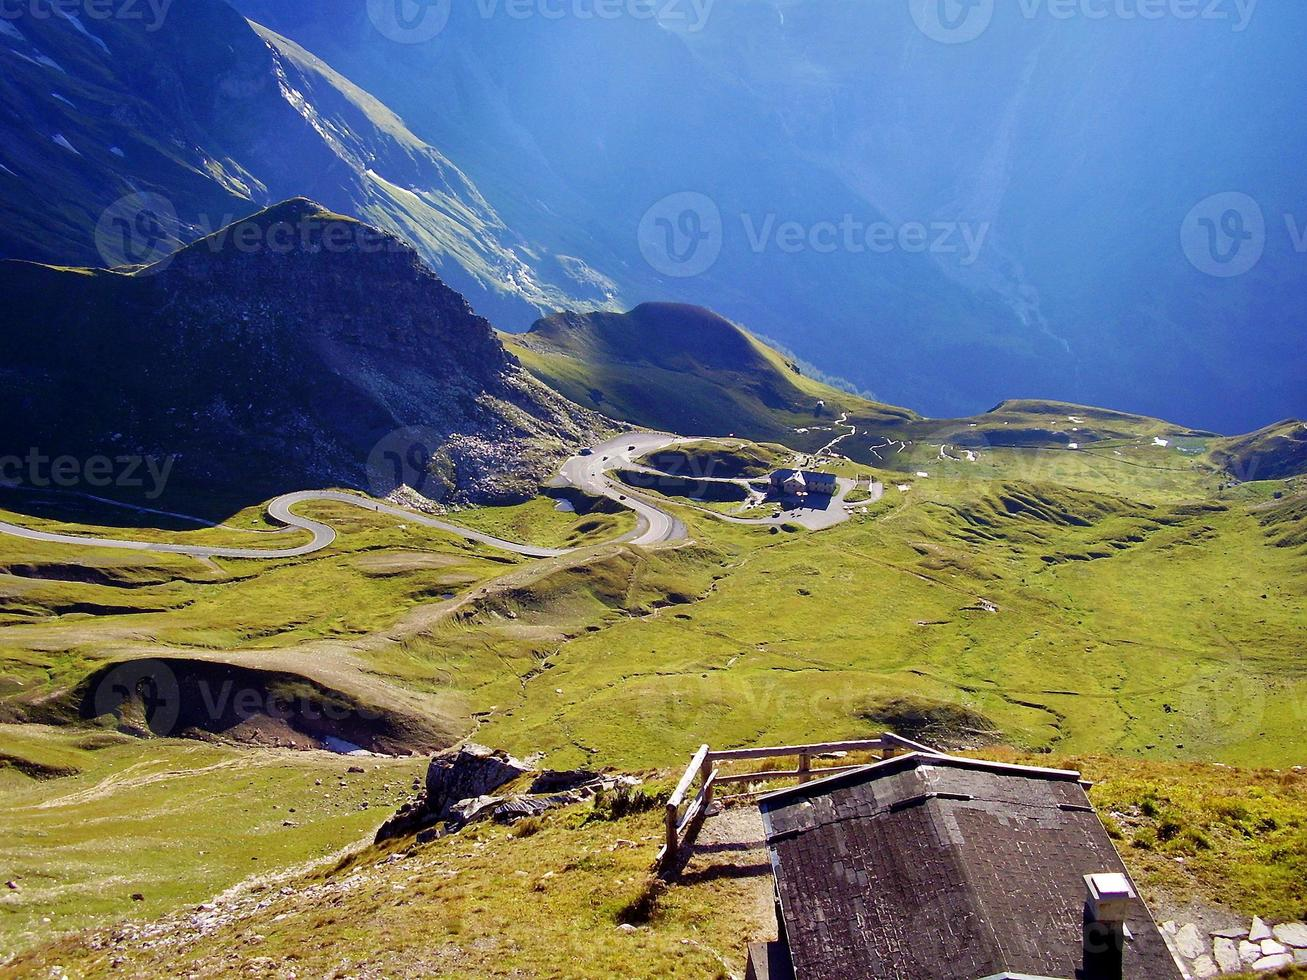 naturaleza de los Alpes foto